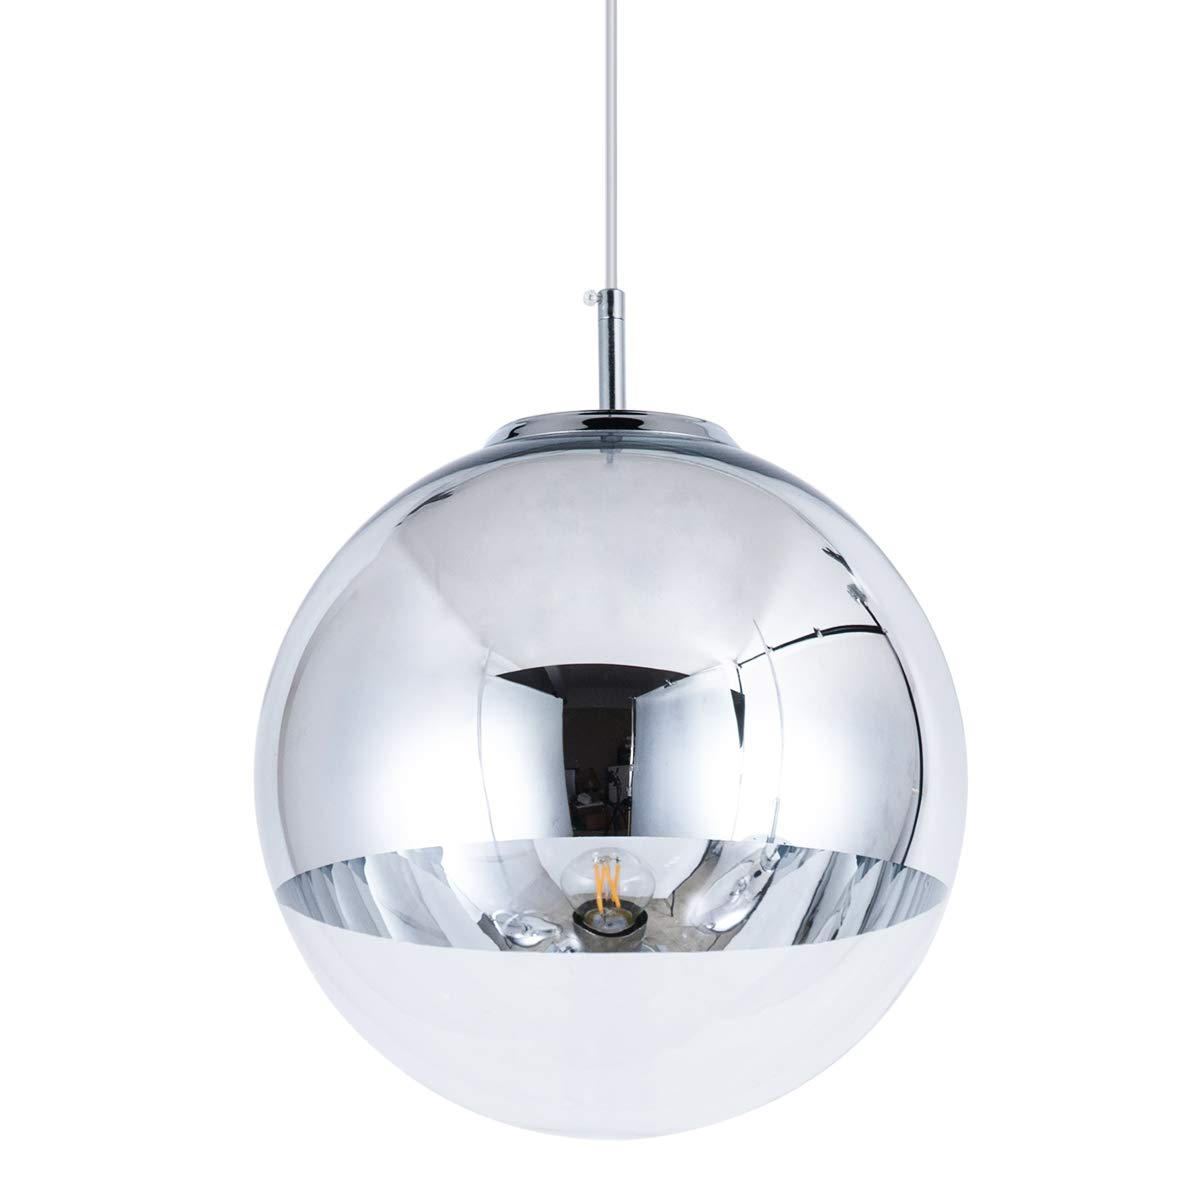 Mzithern modern mini globe pendant lighting with handblown clear glassglass mirror ball pendant lamp for living room kitchen island hallways bar